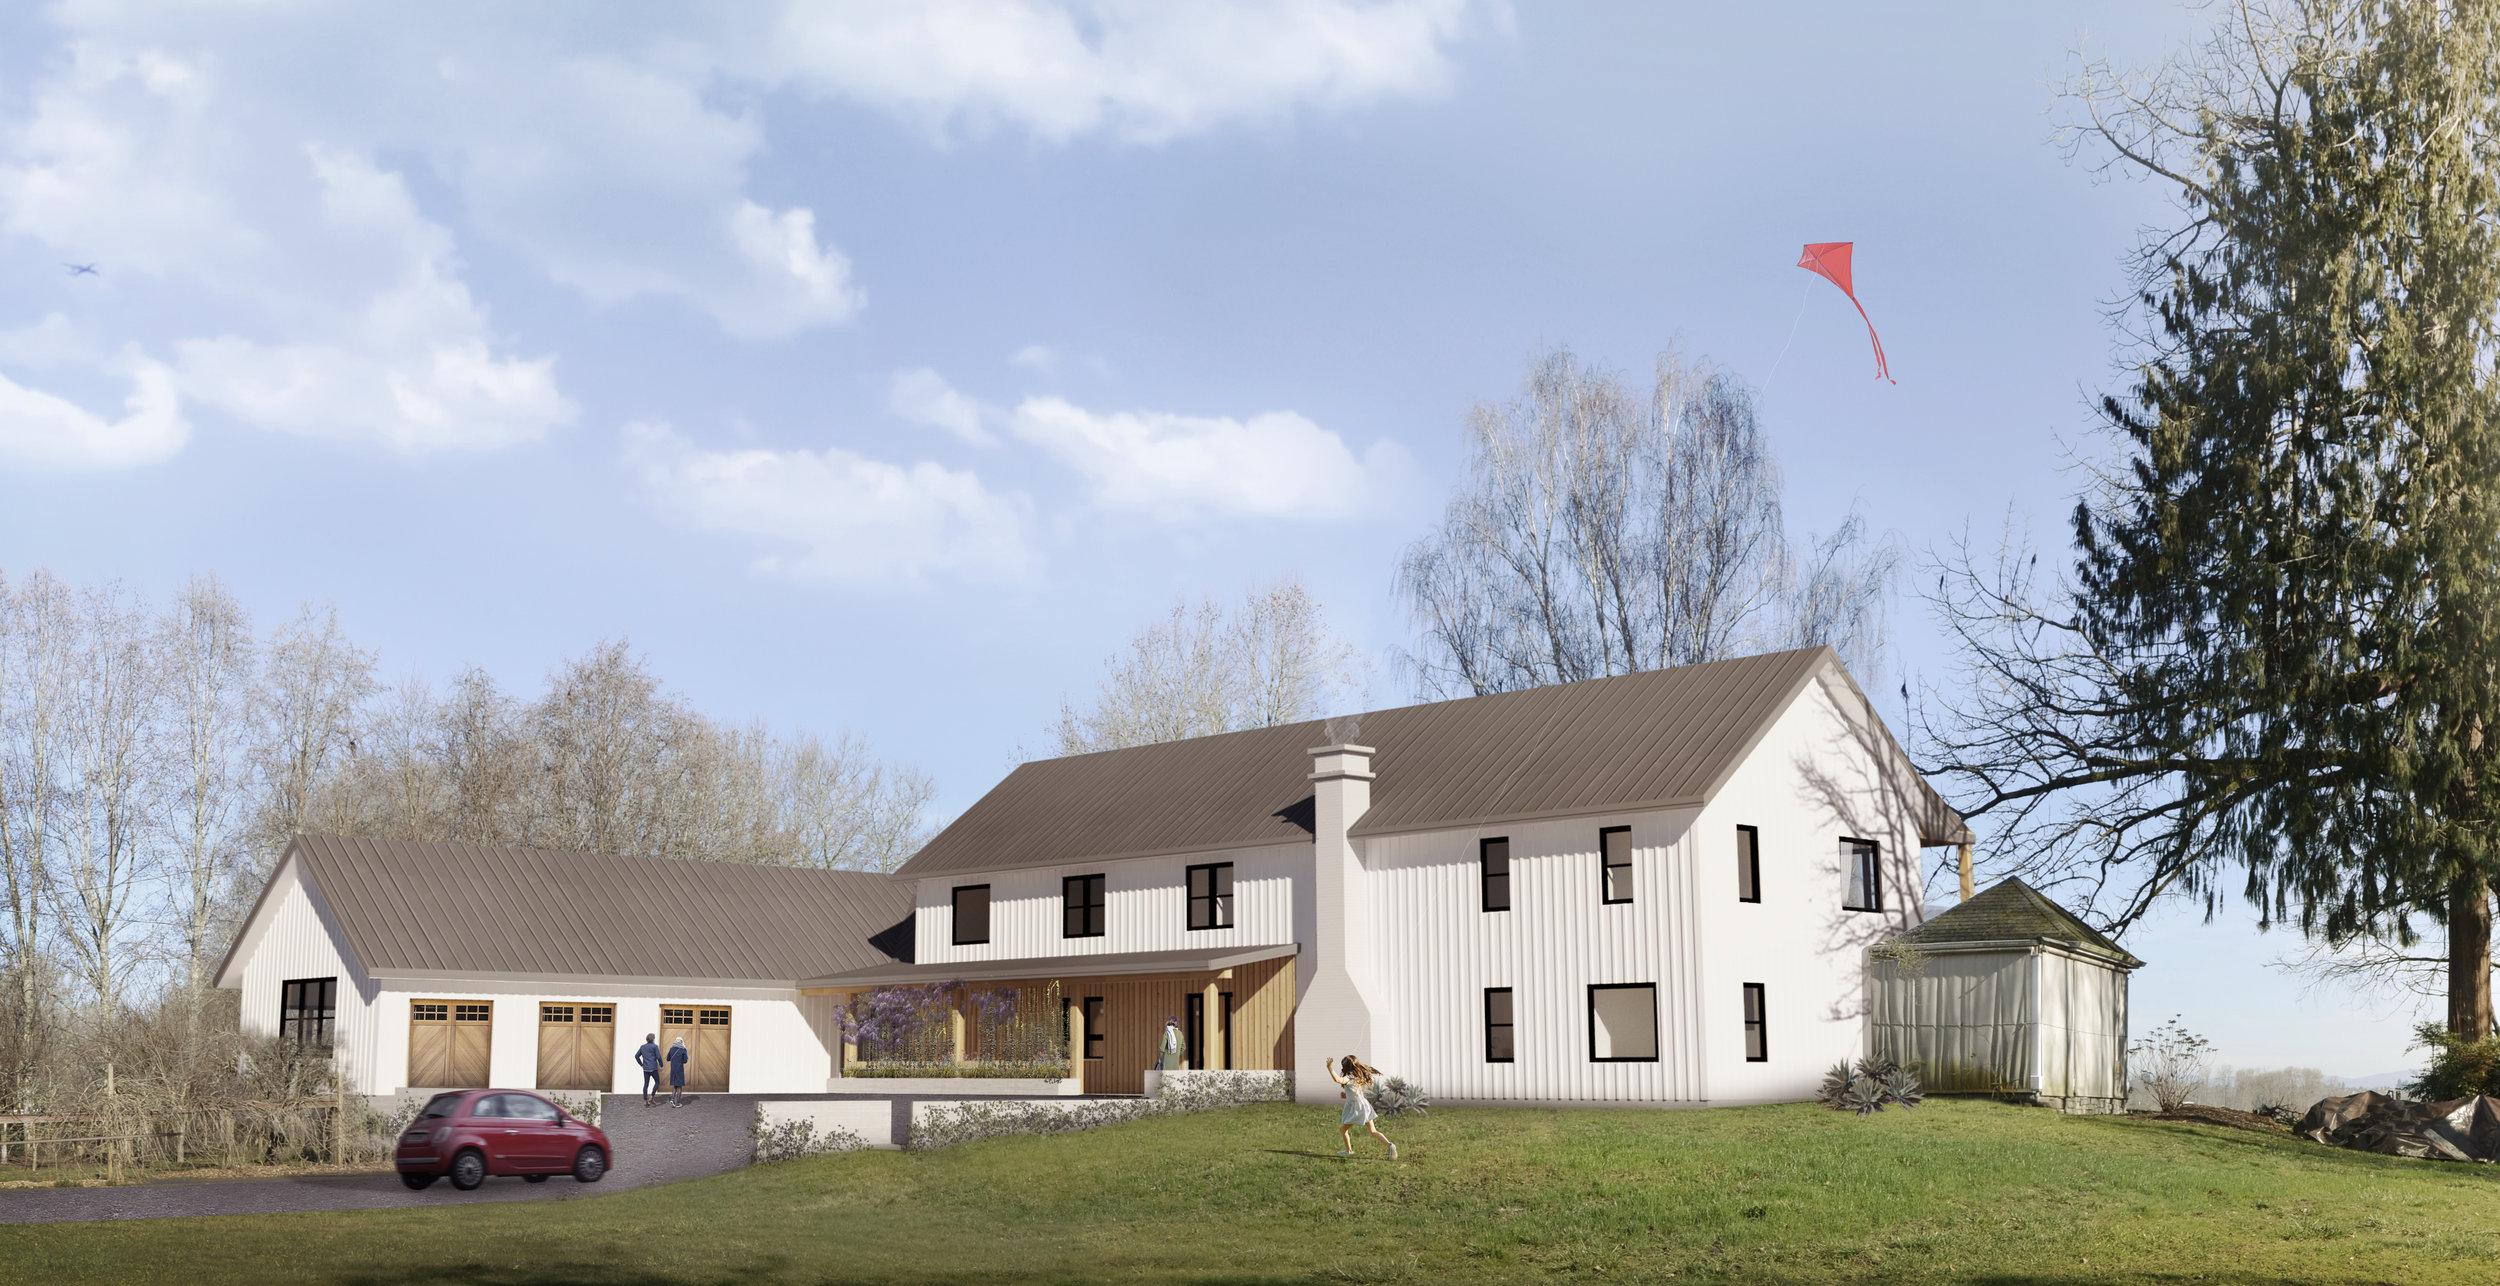 The new house embraces a farmhouse aesthetic.